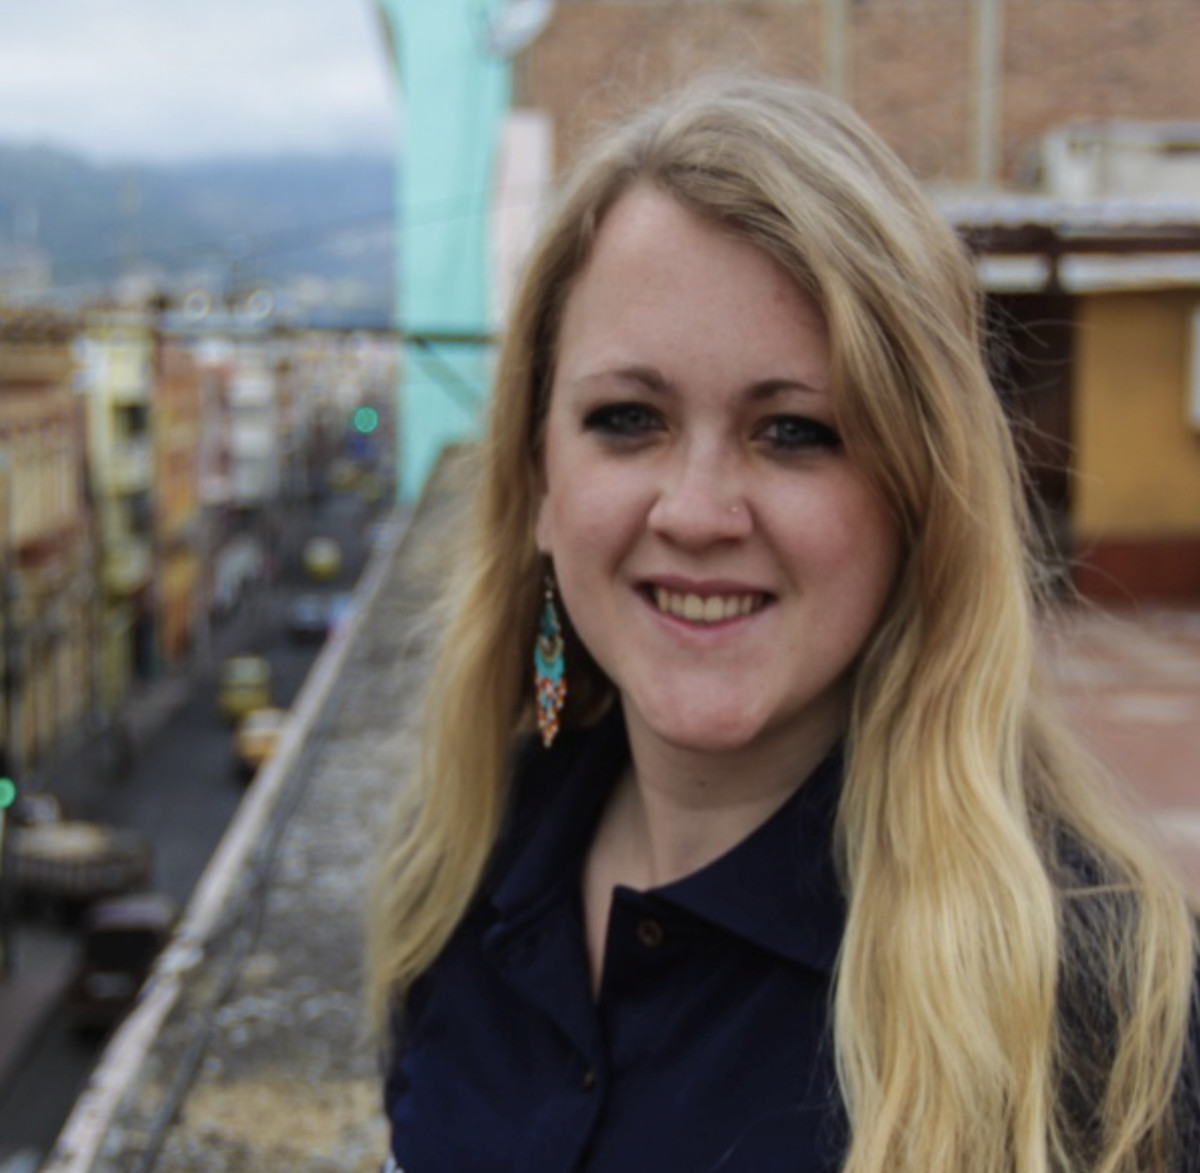 Global Glimpse Team - Stephanie Kridlo